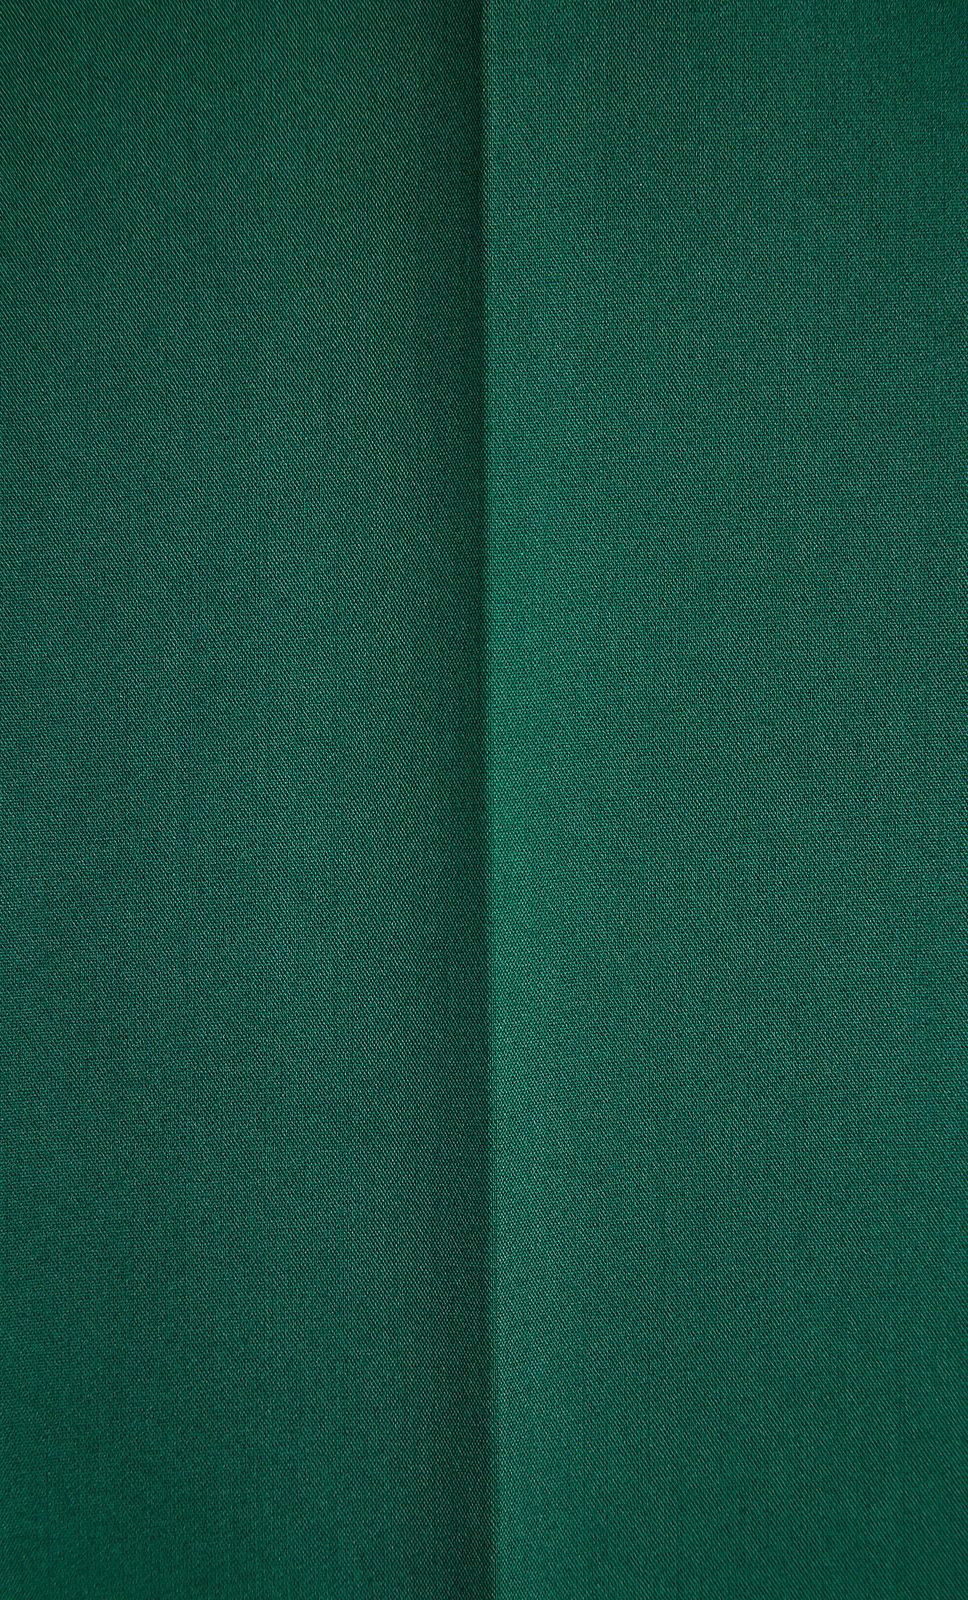 Tribeca-Peacock-Green